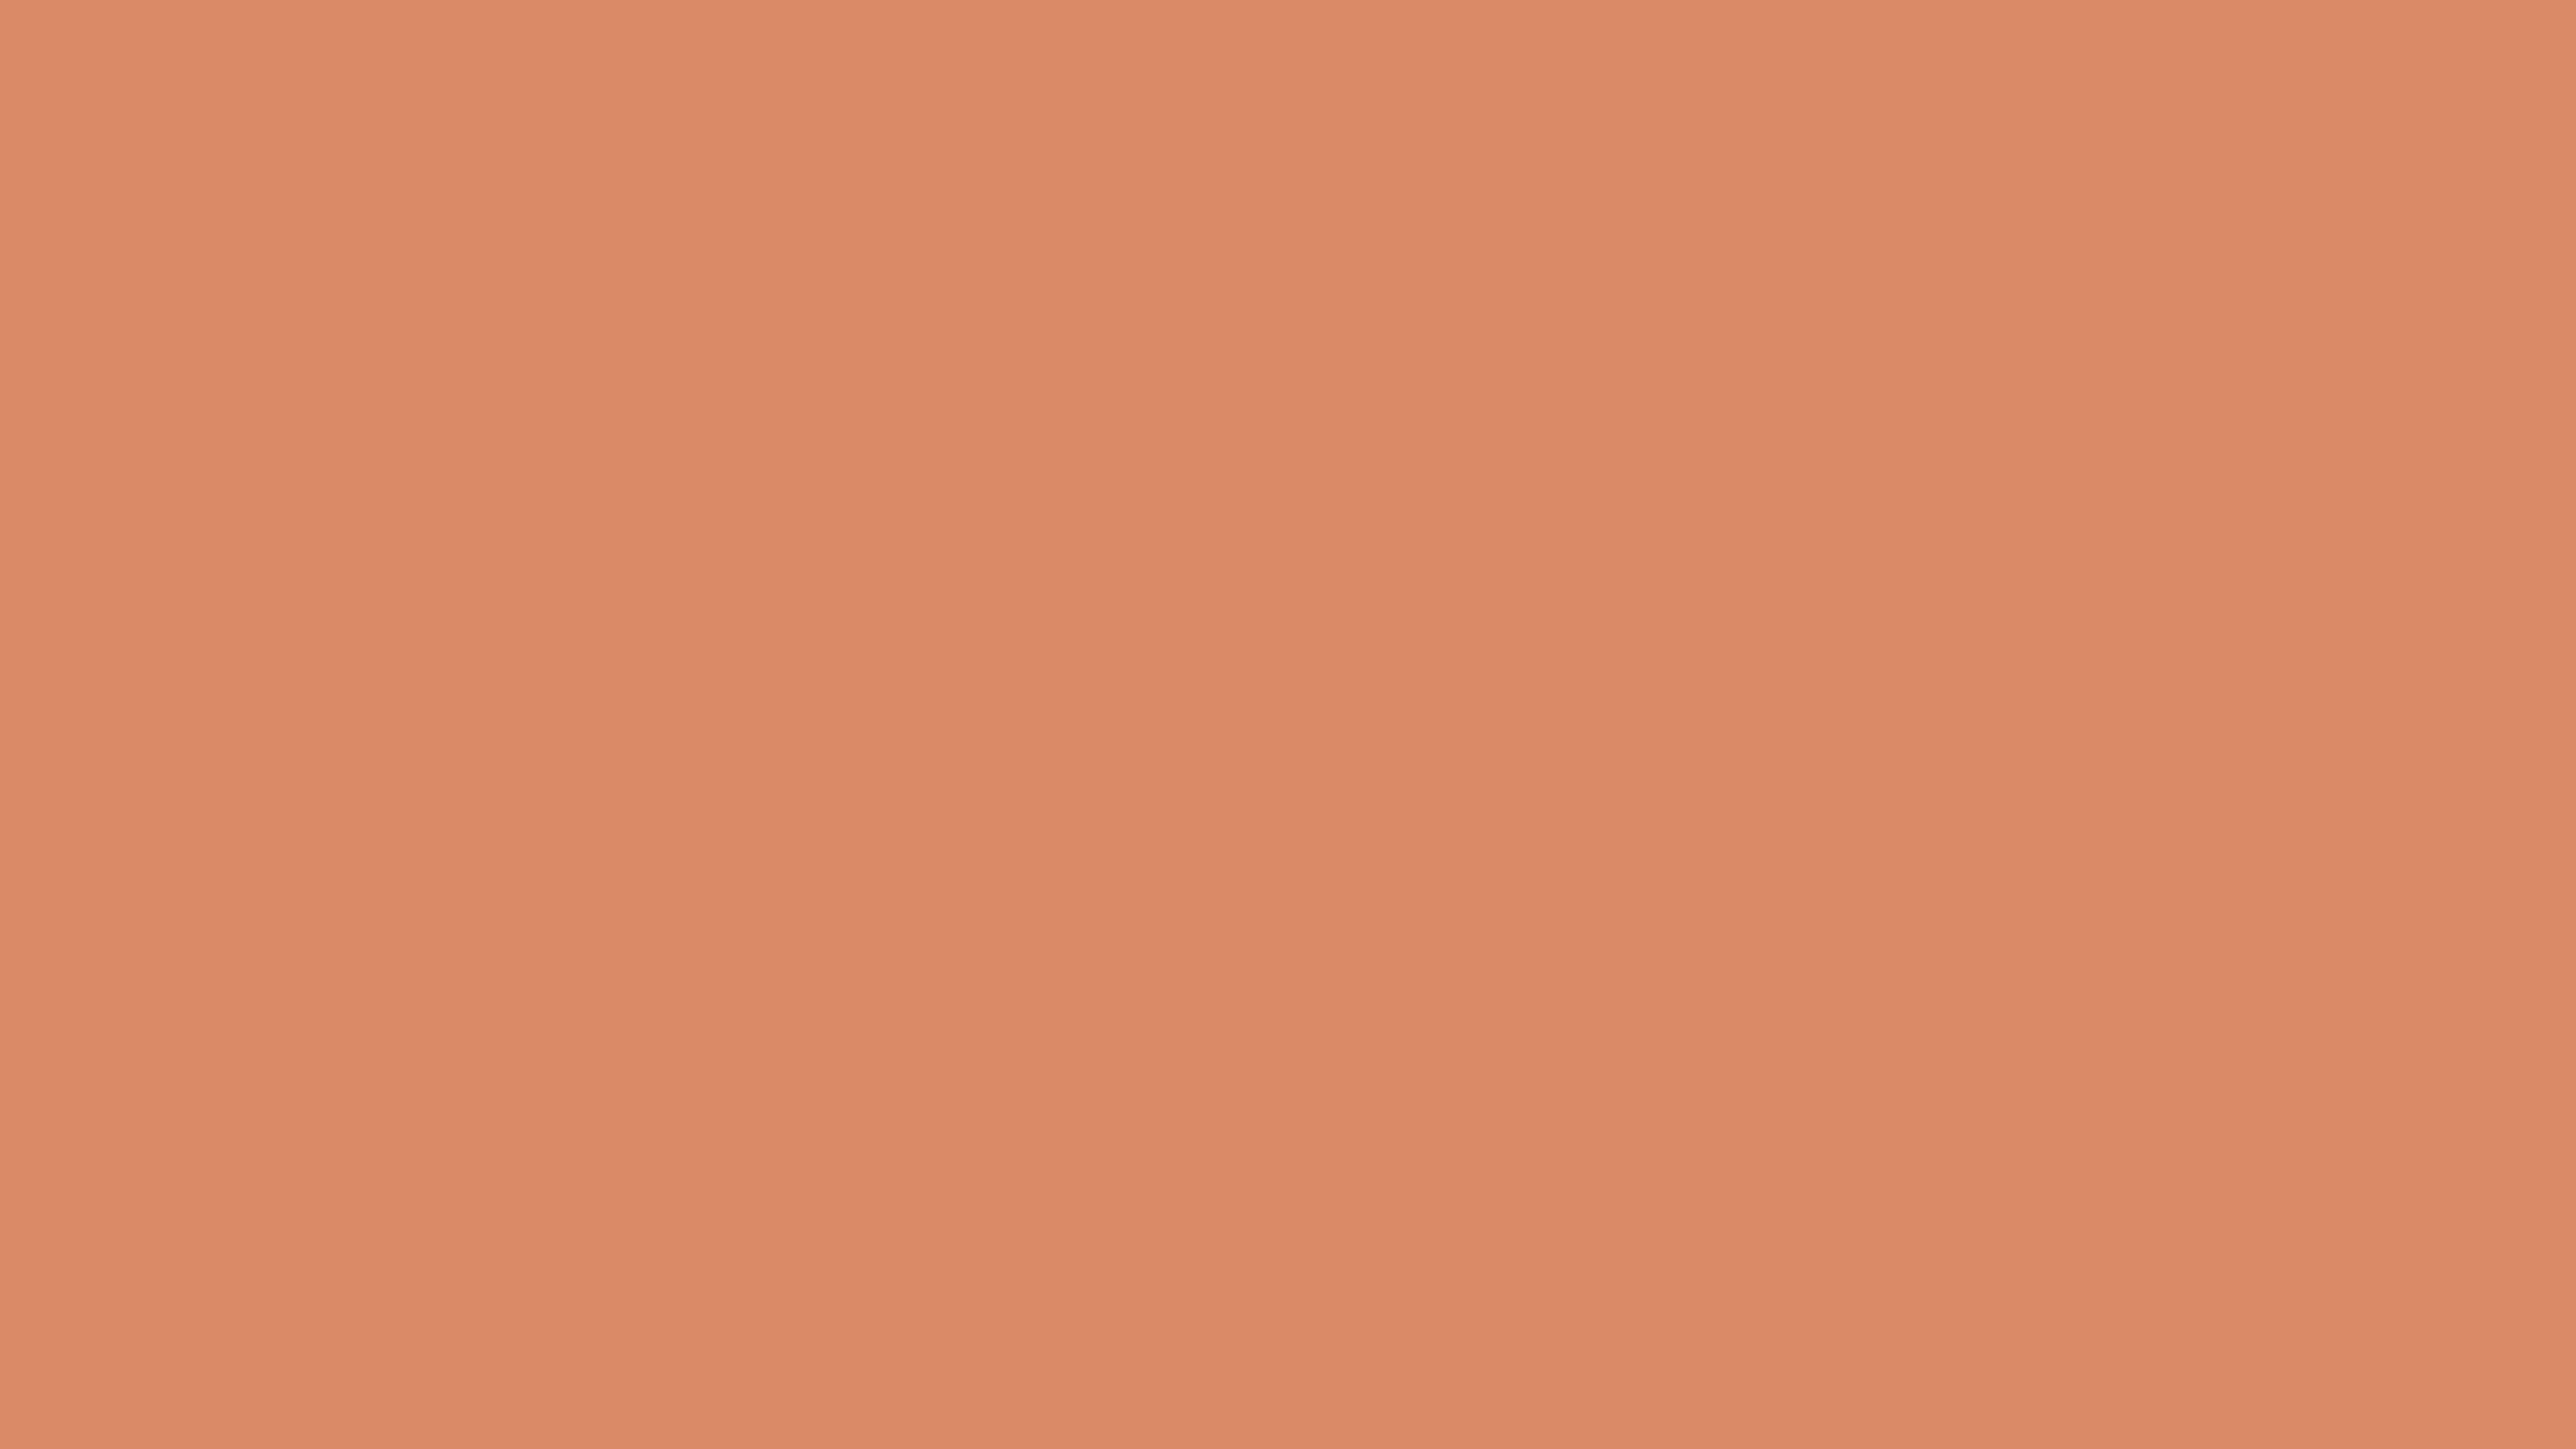 3840x2160 Copper Crayola Solid Color Background